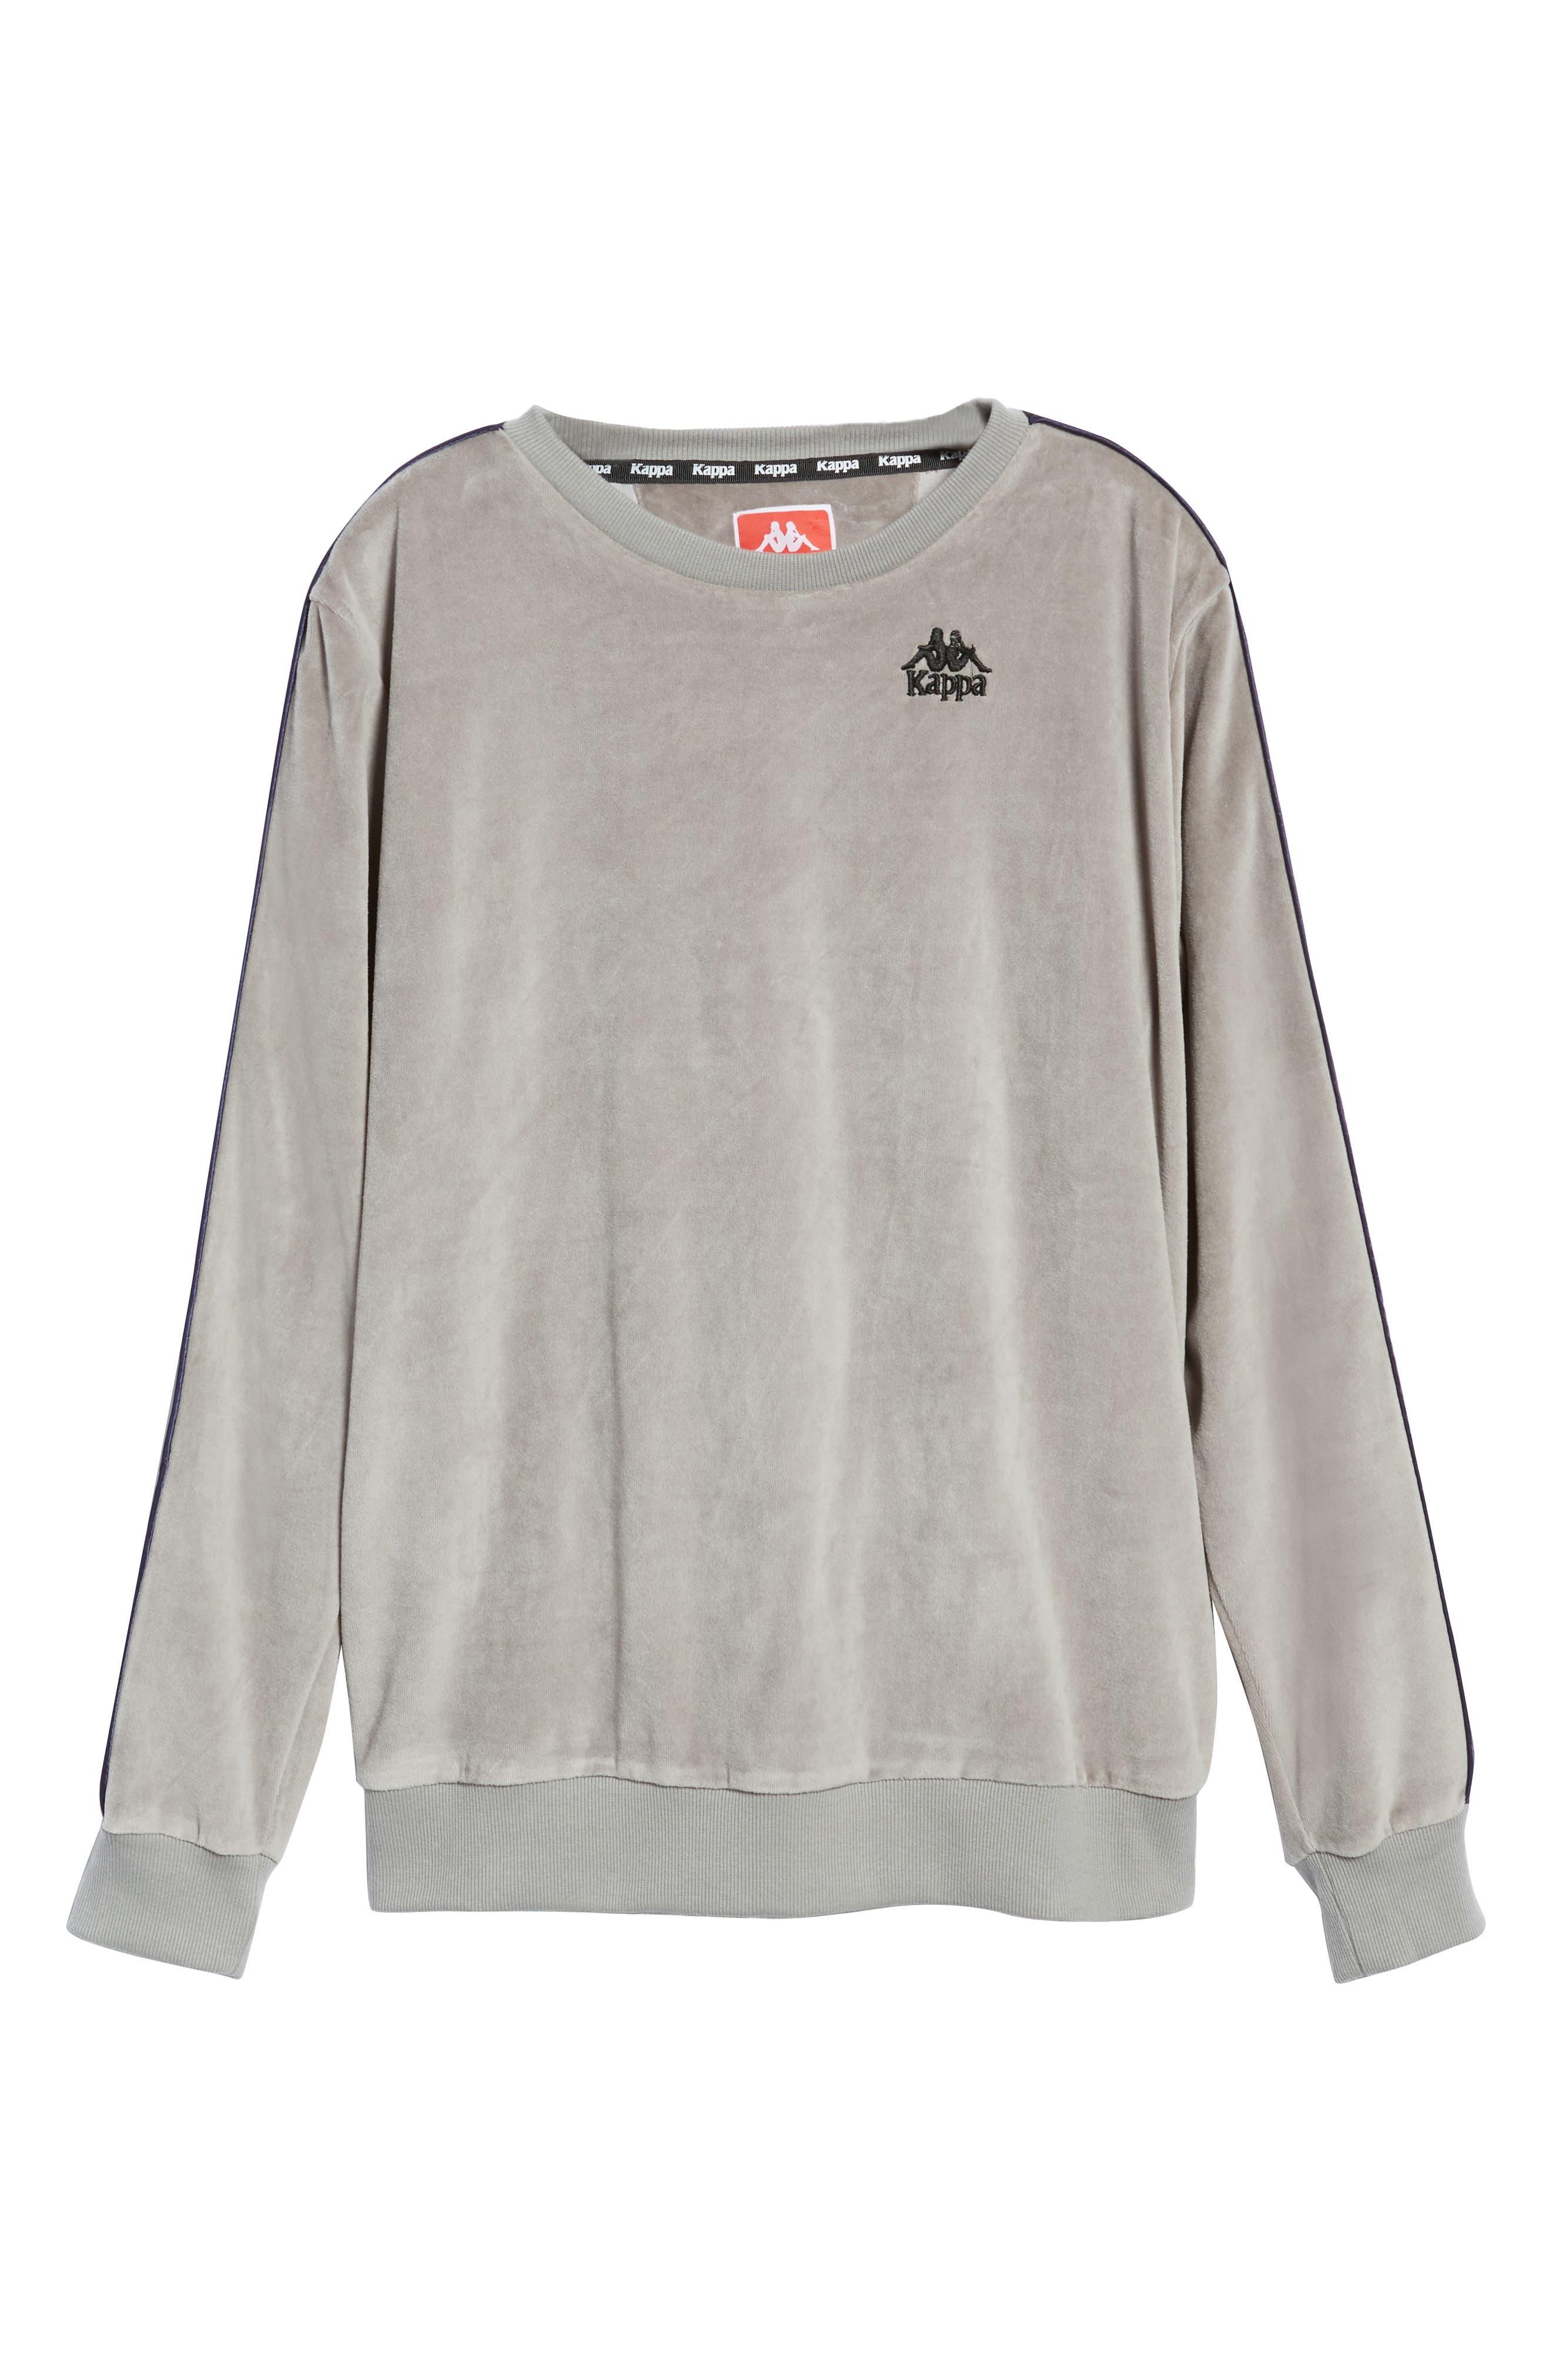 Authentic Aynset Velour Crewneck Sweatshirt,                             Alternate thumbnail 6, color,                             GREY MIST/ BLACK/ WHITE